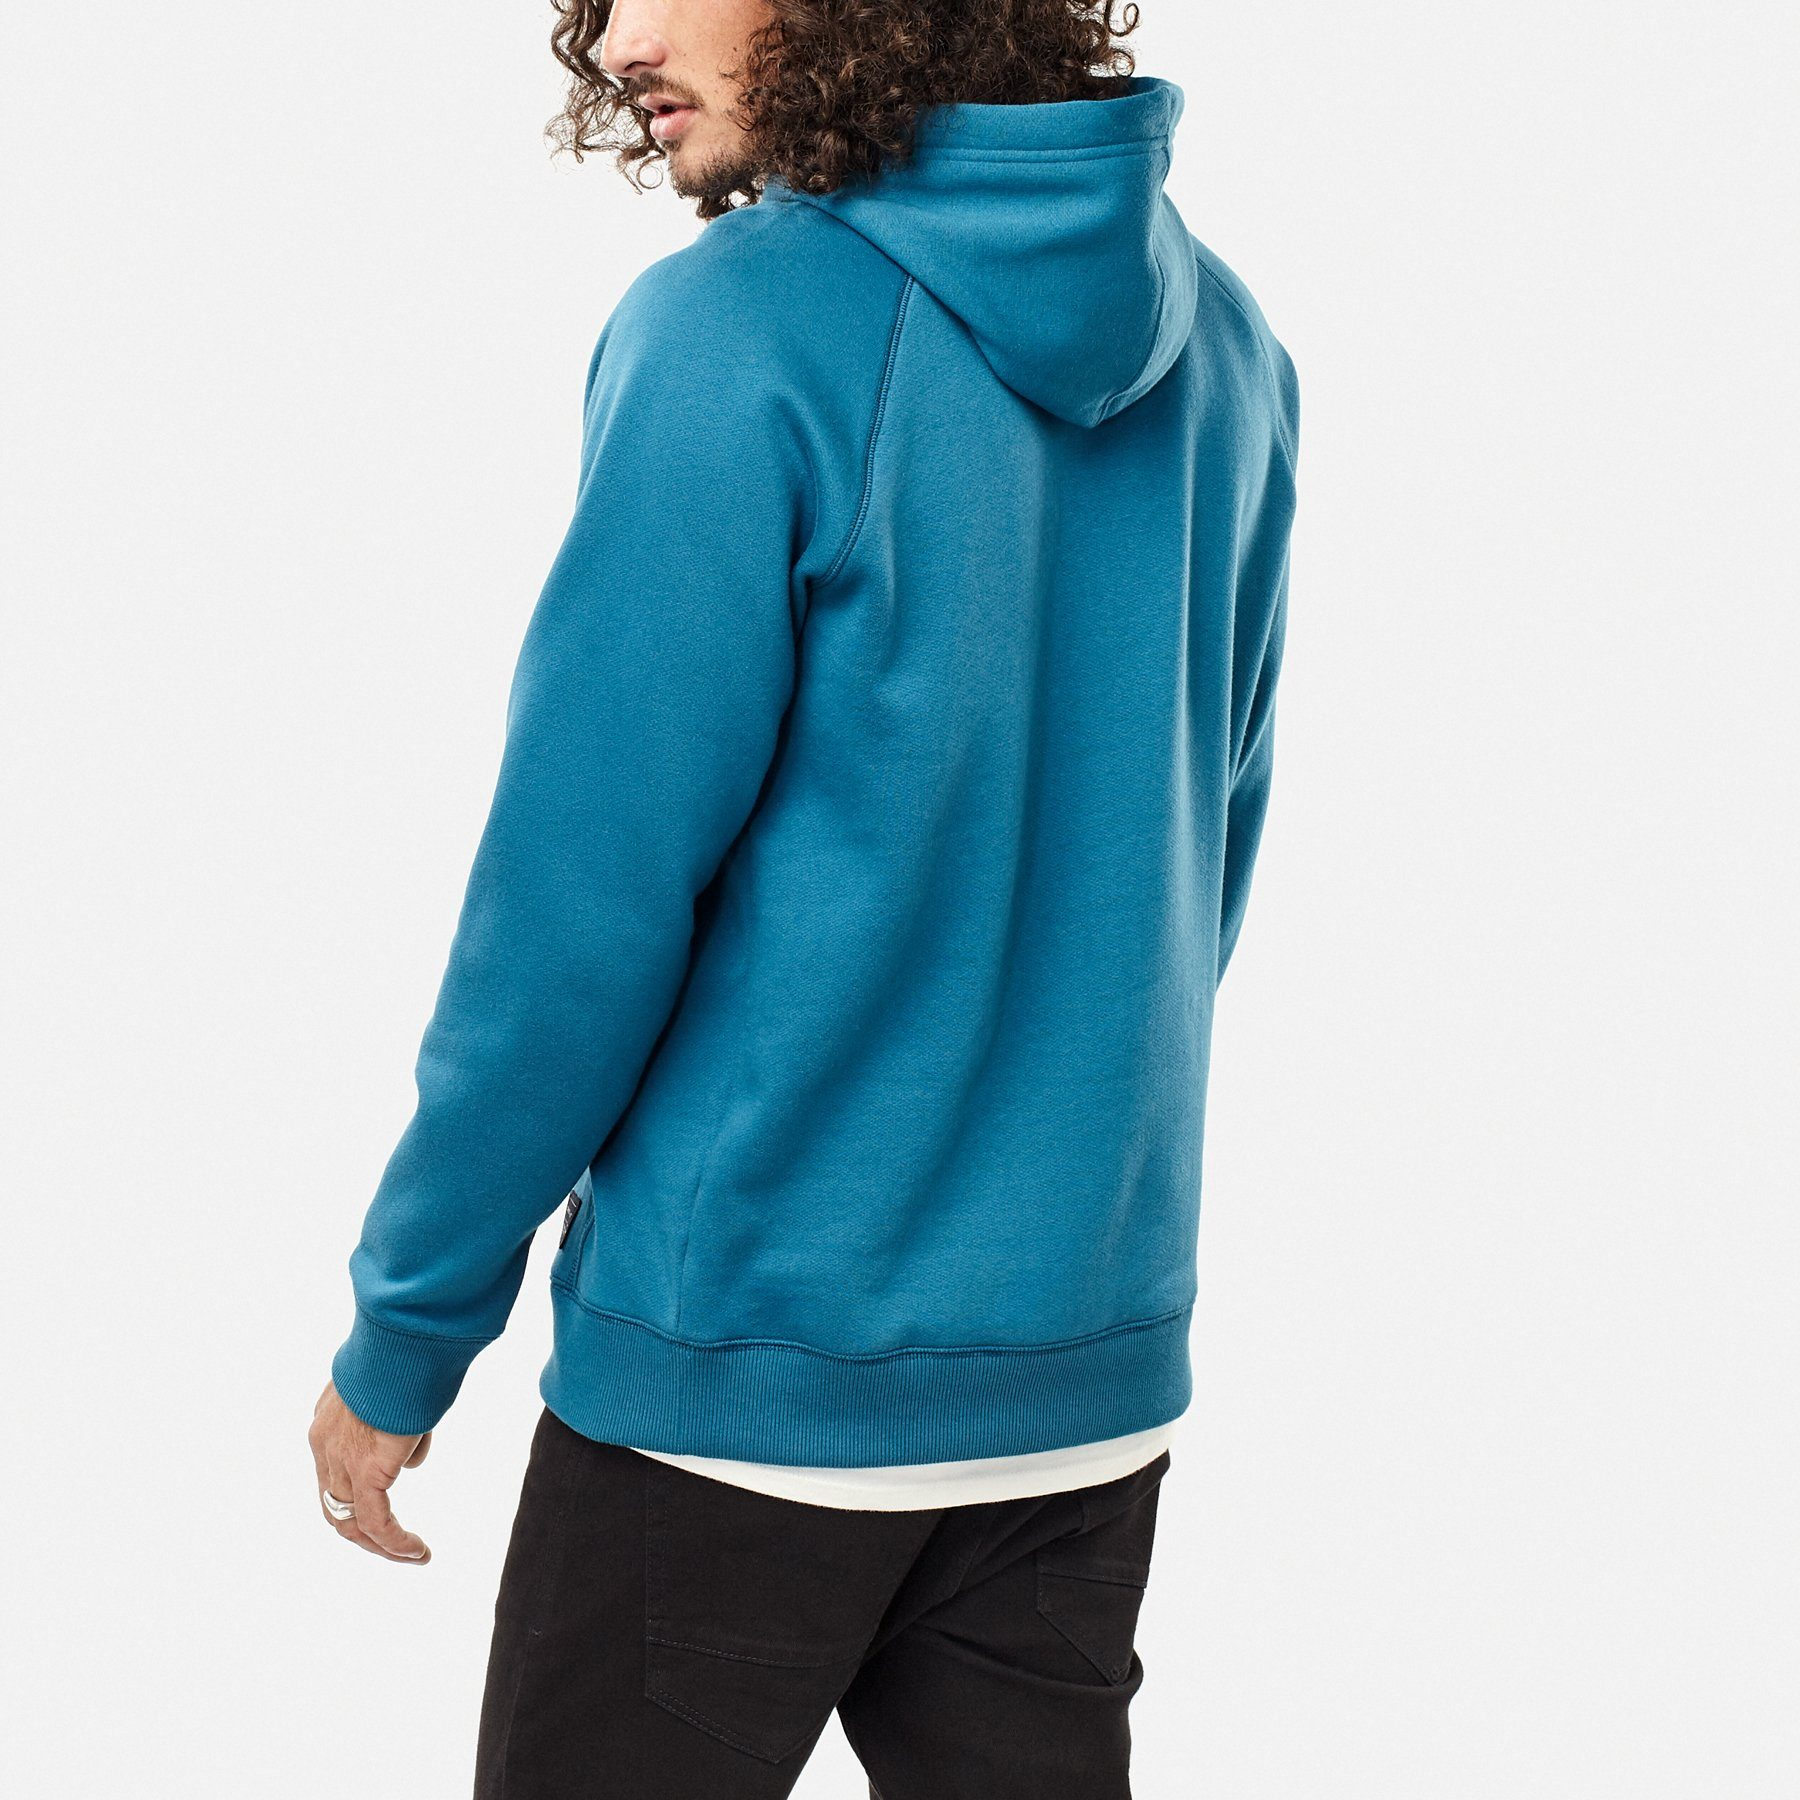 Hoodie«Verstellbare Kaufen Online »o'neill Kapuze Kapuzensweatshirt O'neill X8nwkN0OP